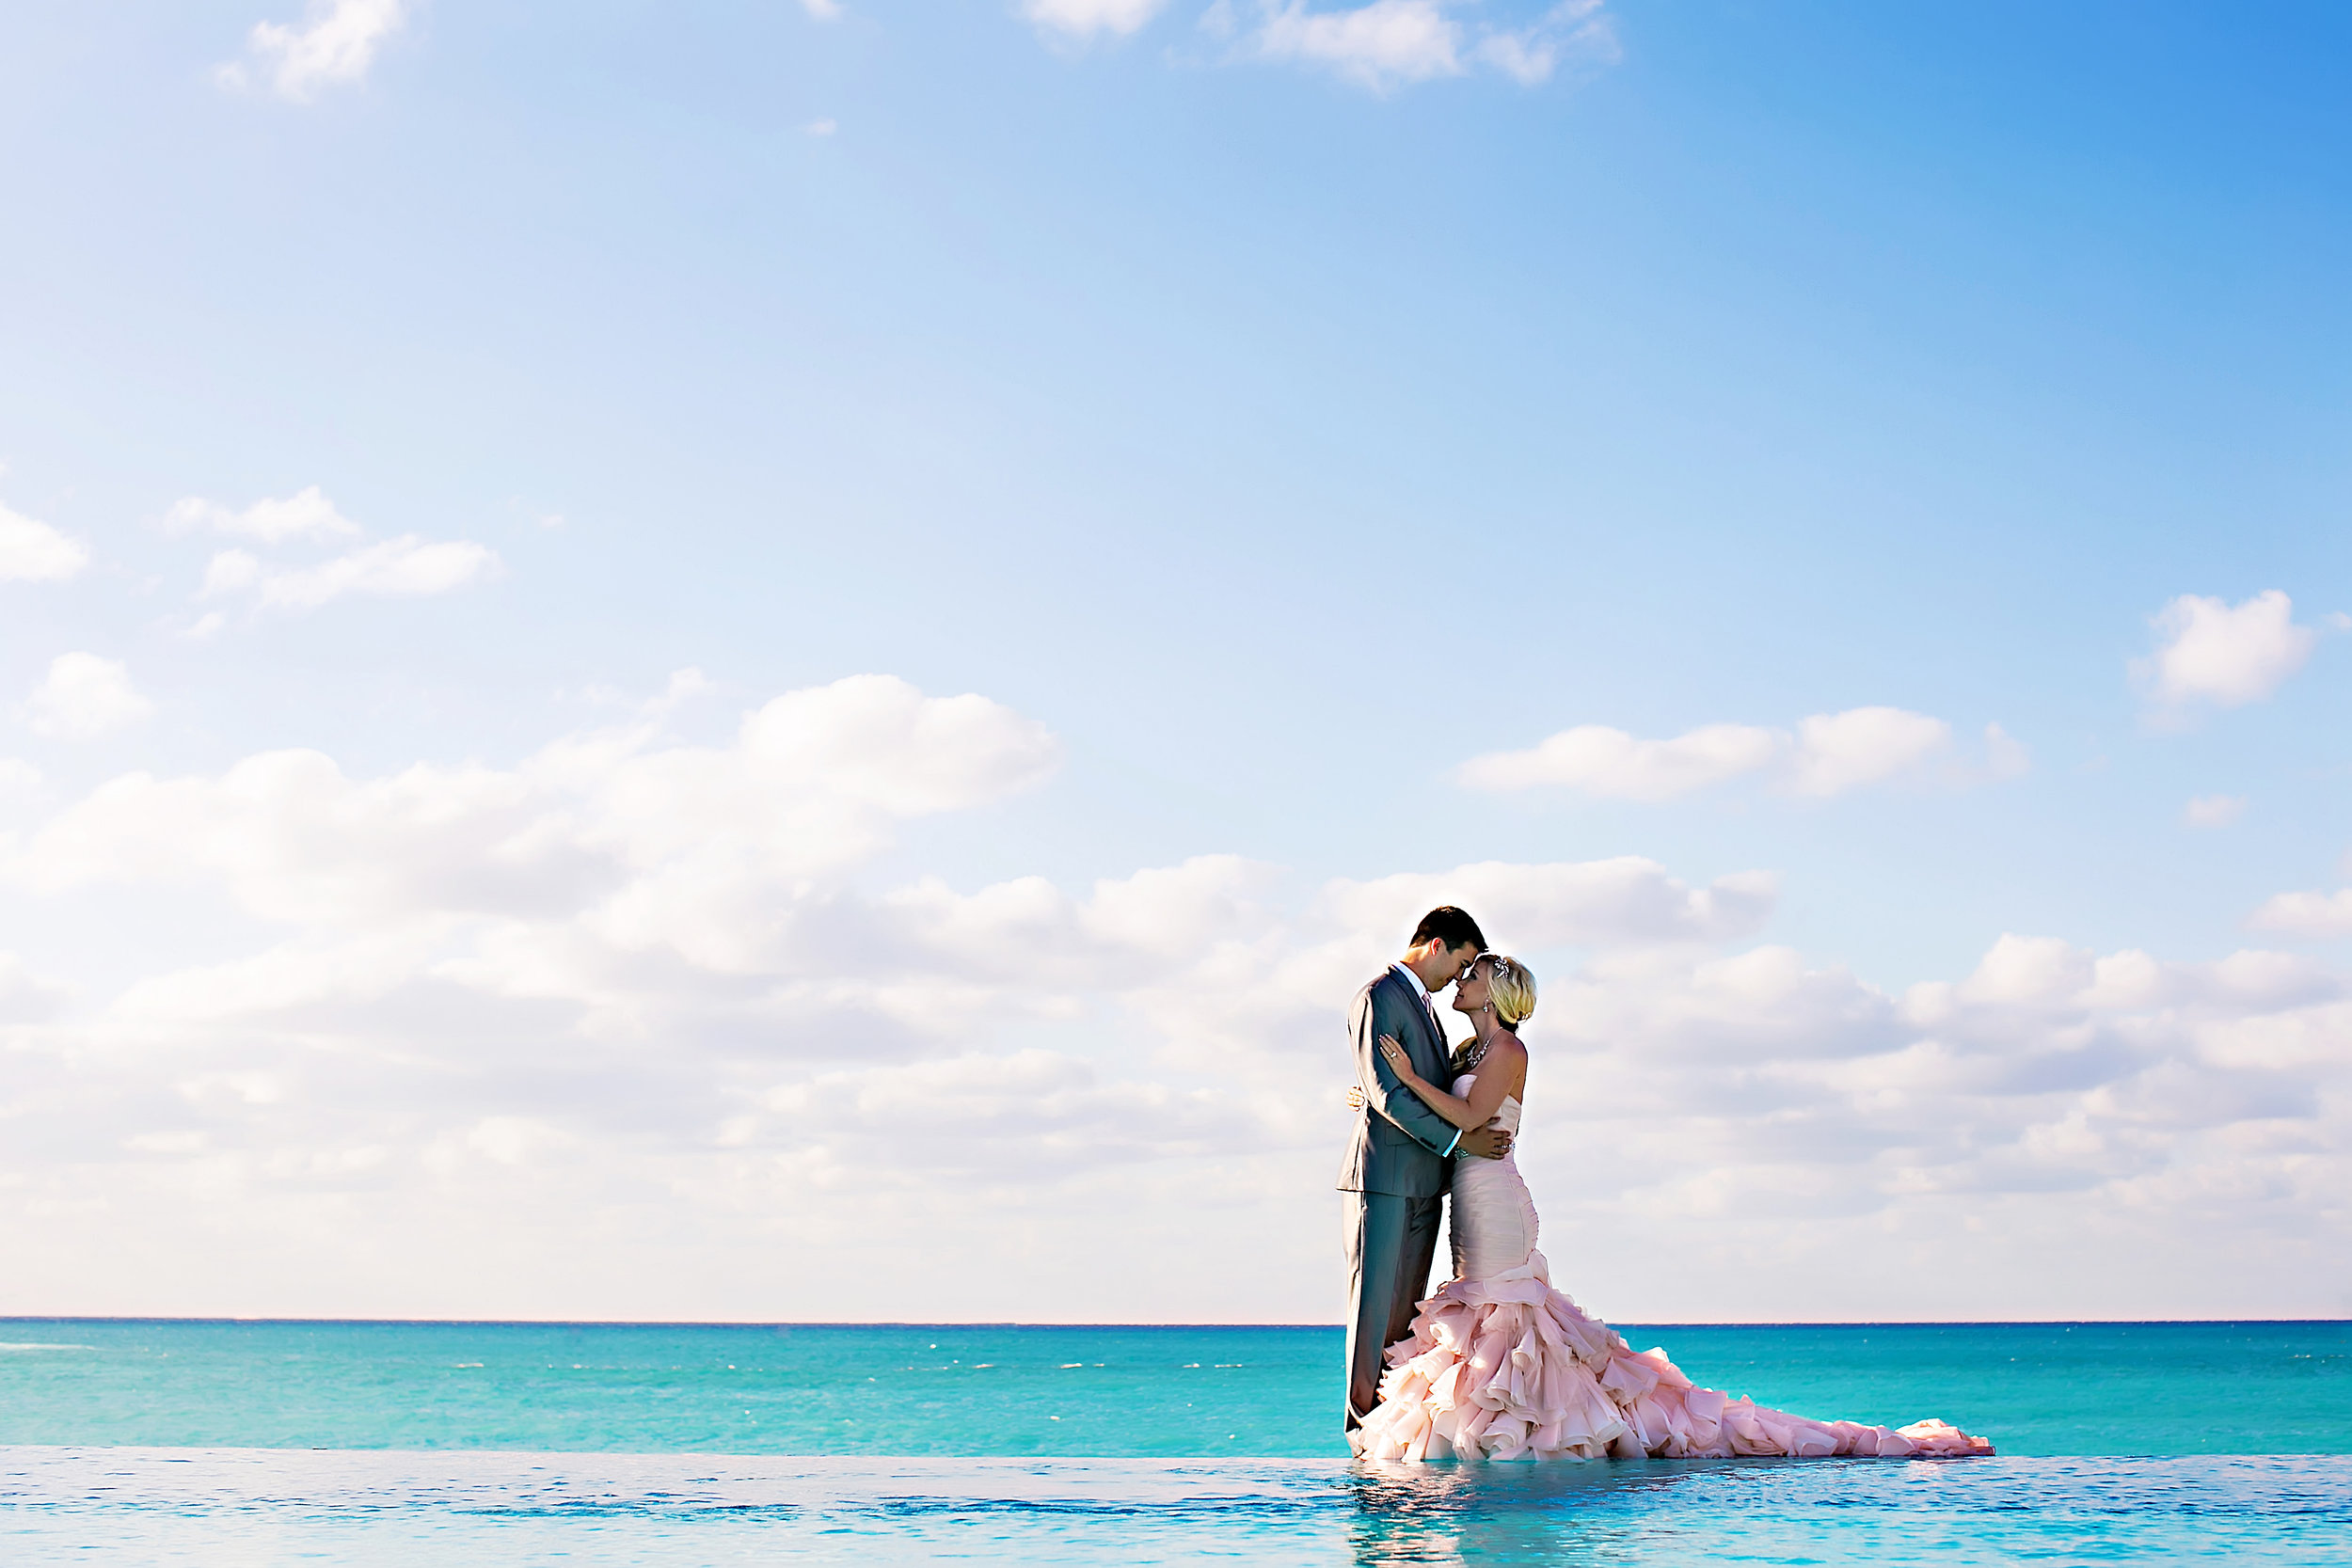 bimini, bahamas, pink wedding gown, wedding photography, ocean, beach, hilton at resorts world bimini, limelight photography